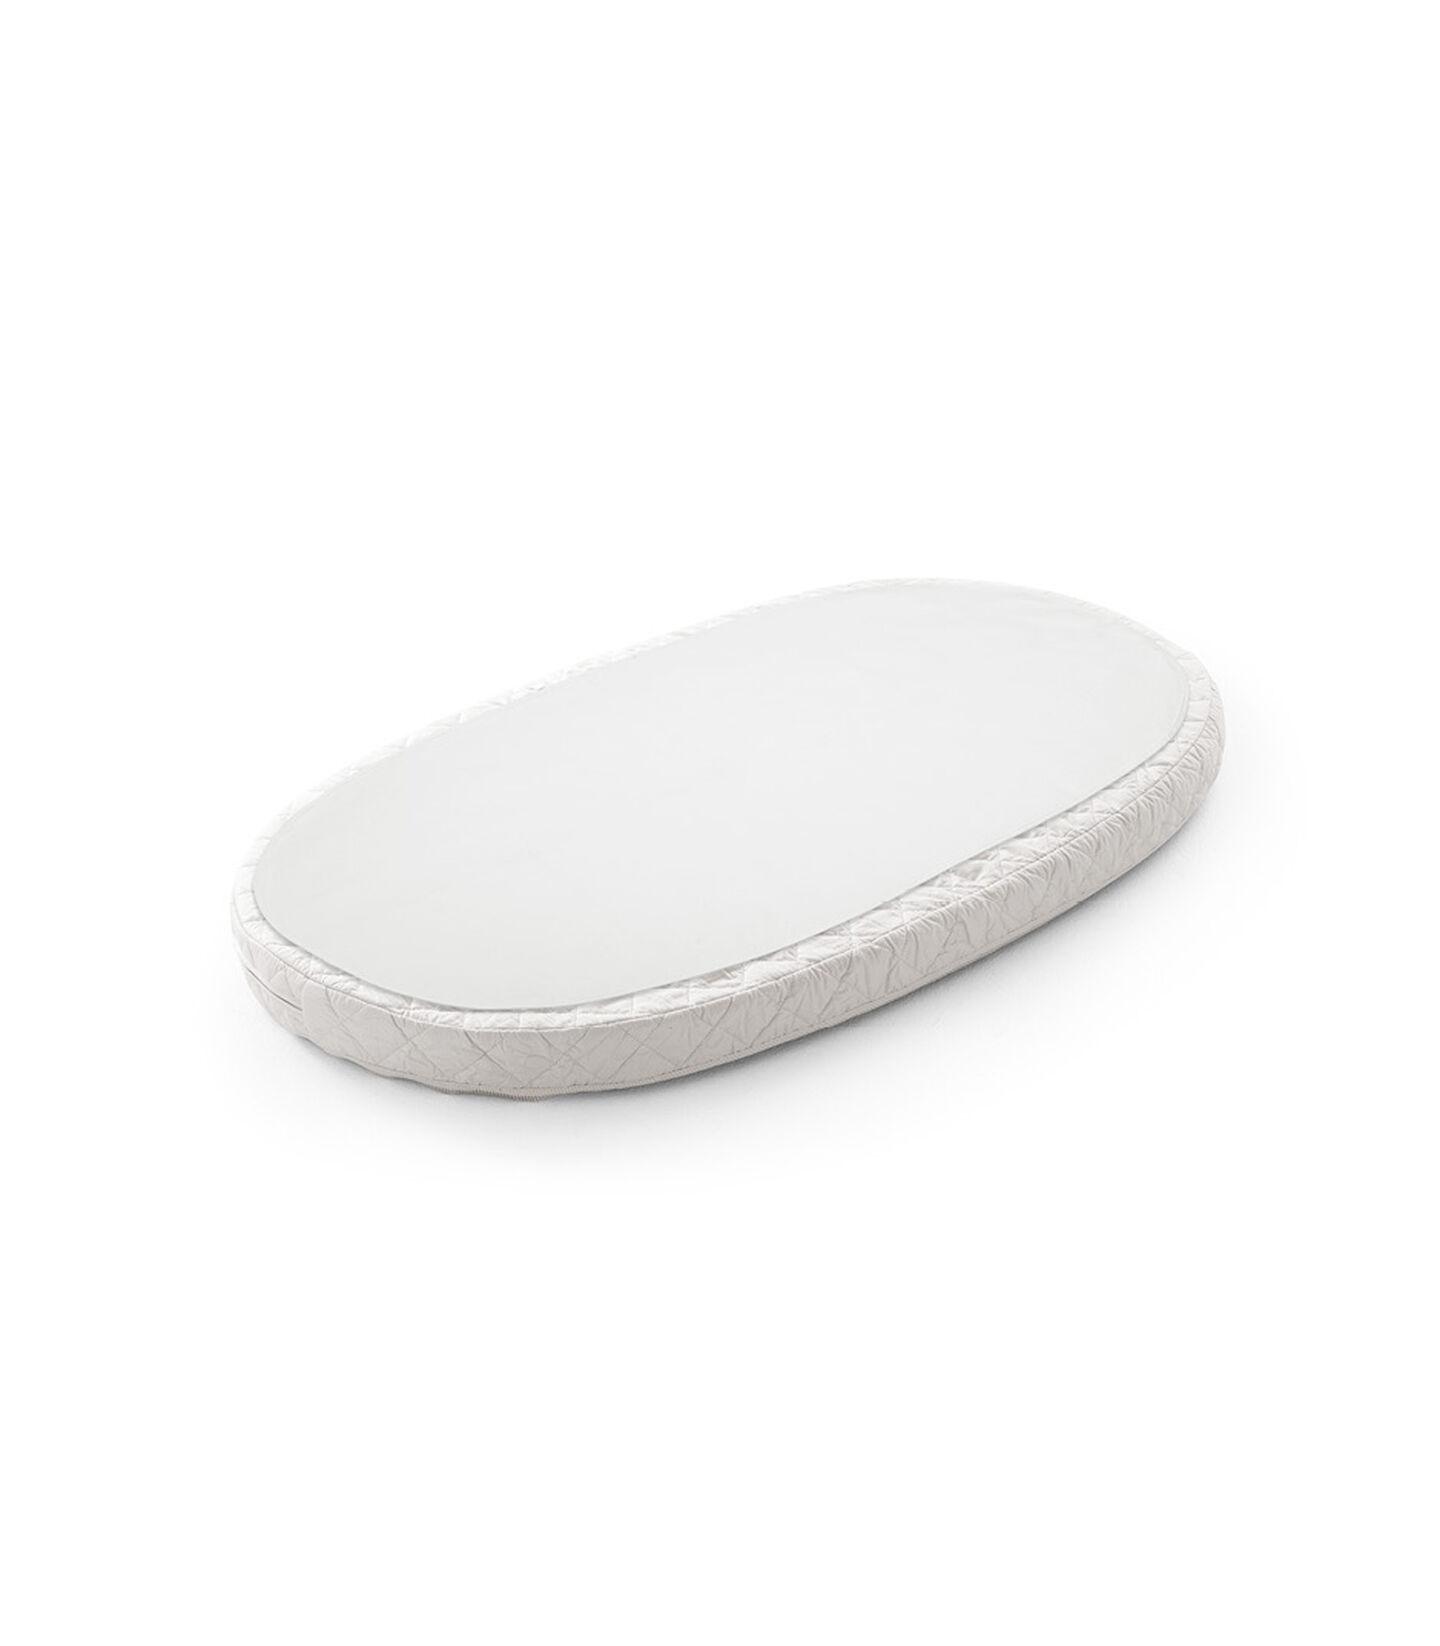 Stokke® Sleepi™ Protection Sheet Oval, , mainview view 2